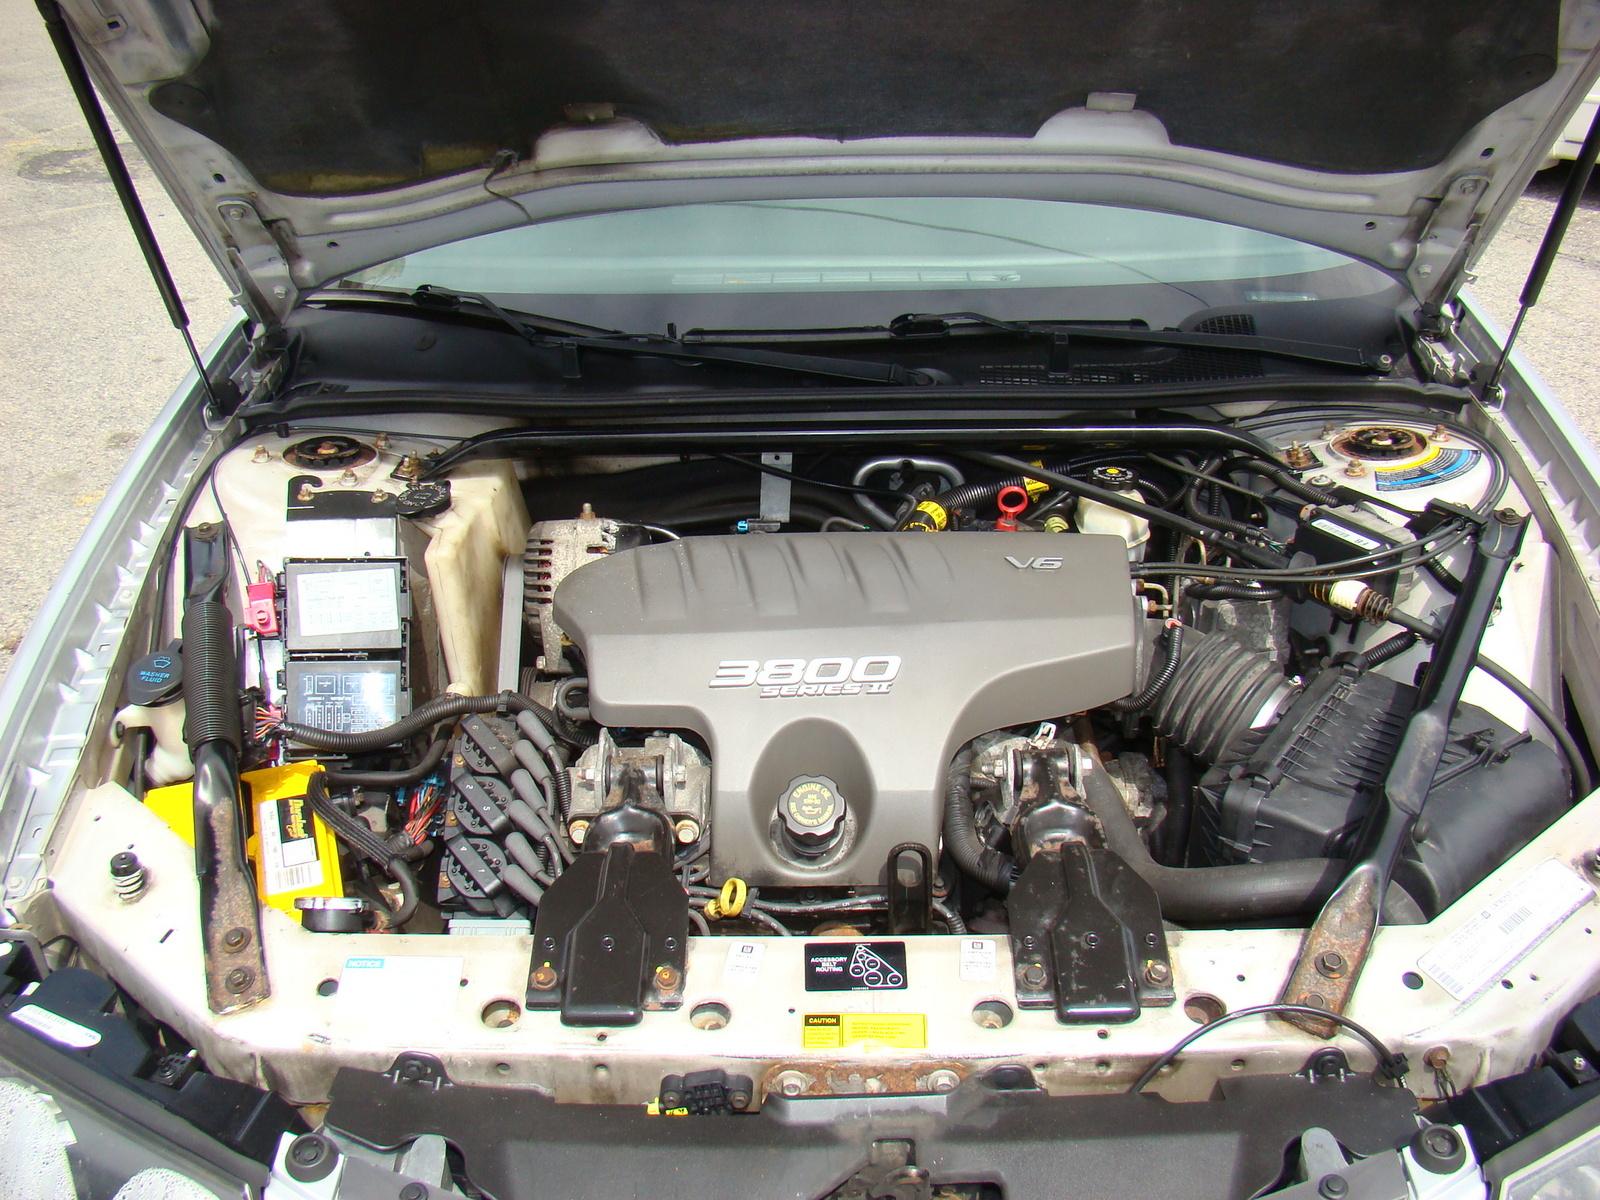 2001 Chevrolet Impala - Pictures